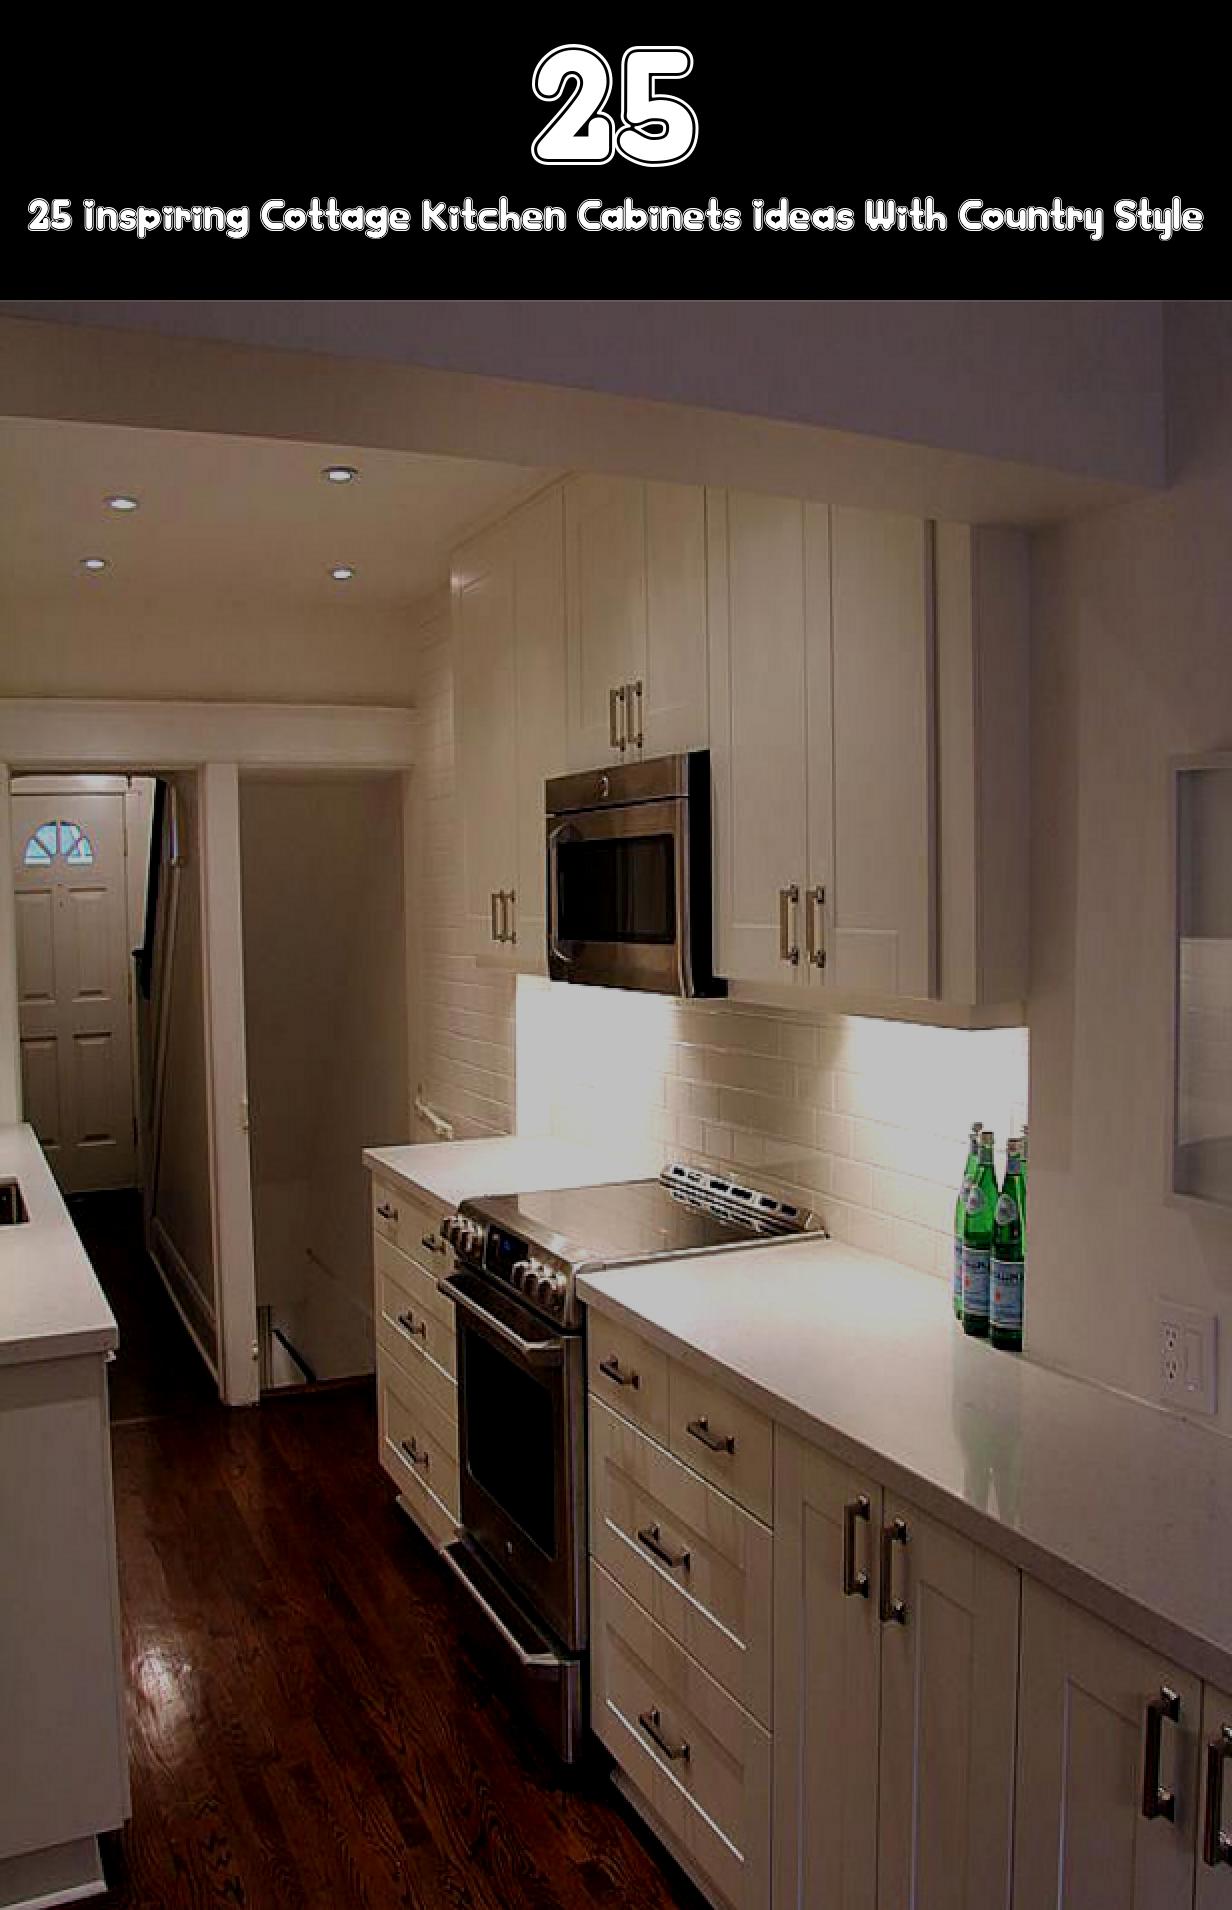 8 Masterful Hacks Lowes Kitchen Remodel Farmhouse Sinks Kitchen